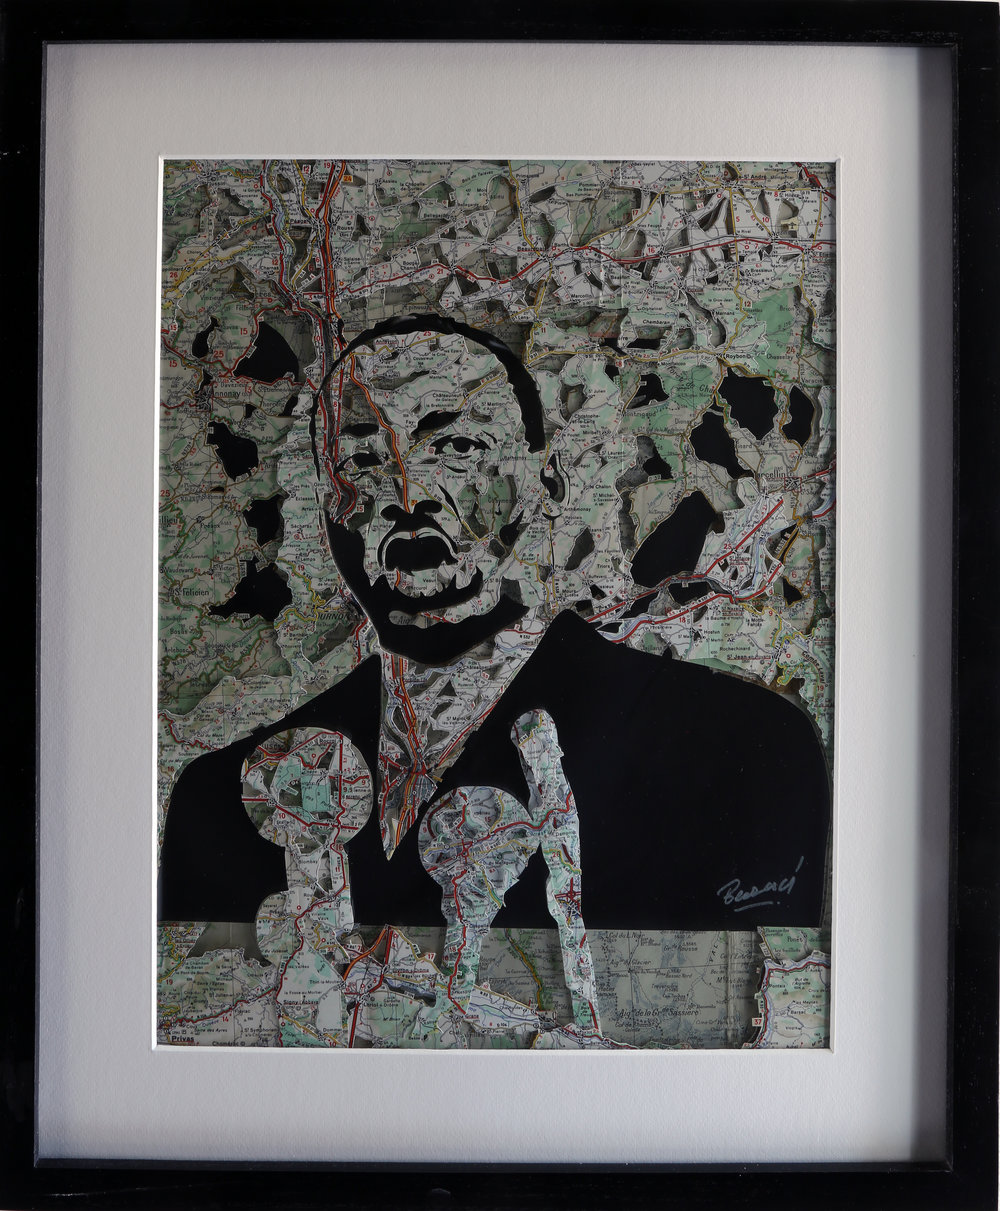 GalleryOonH-Joanathan Bessaci-MLK-2017-Michelin maps and glass-16x20-1400.JPG